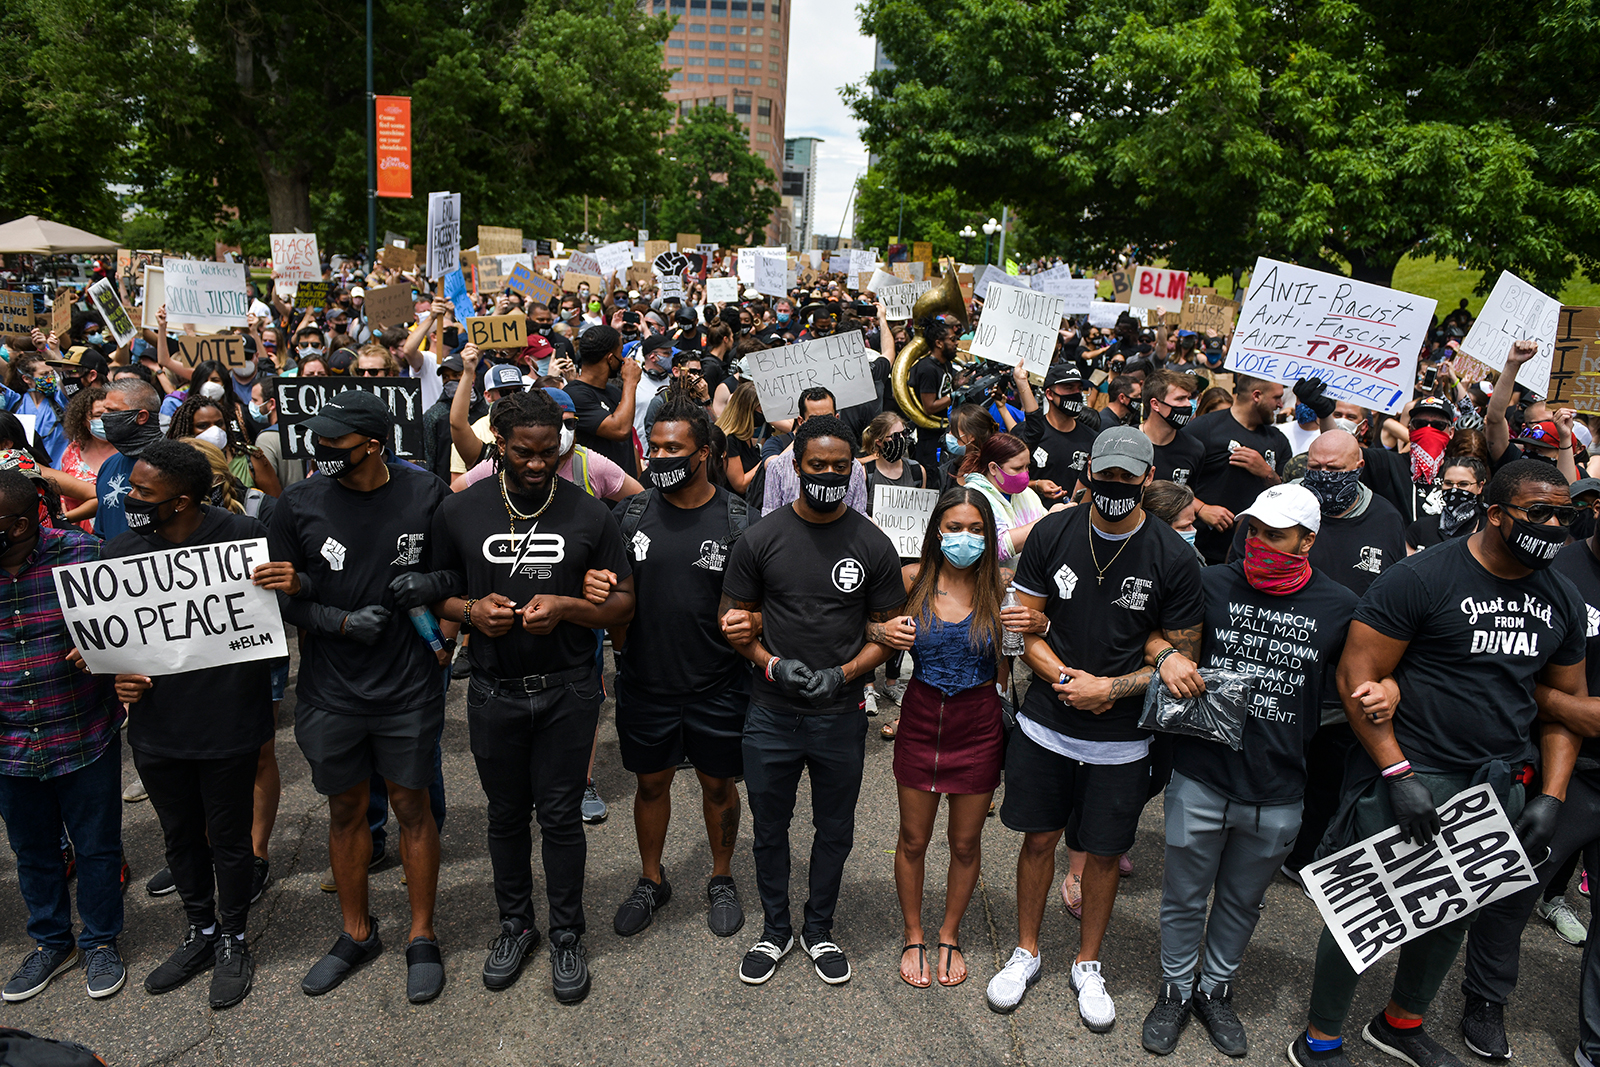 Denver Broncos players join people protesting on June 6, in Denver, Colorado.